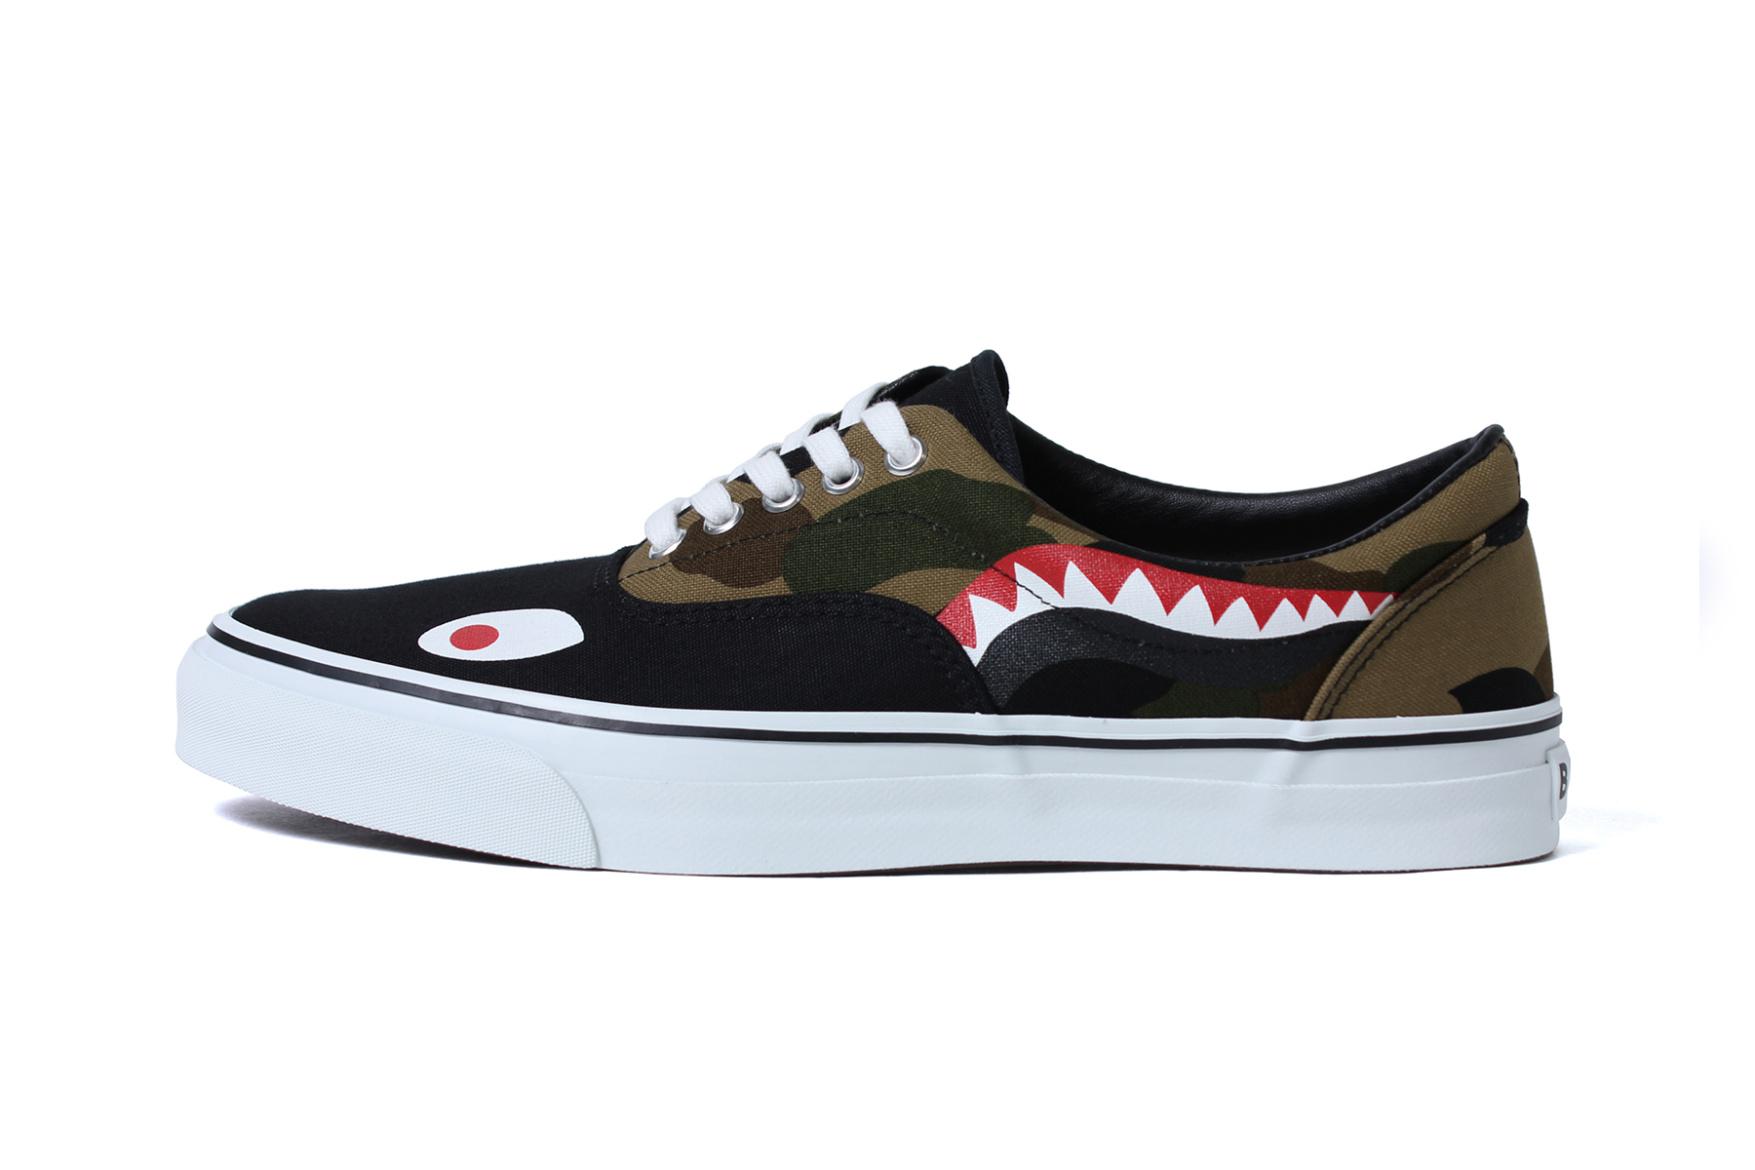 Bape Shark Slip On - TRENDS periodical